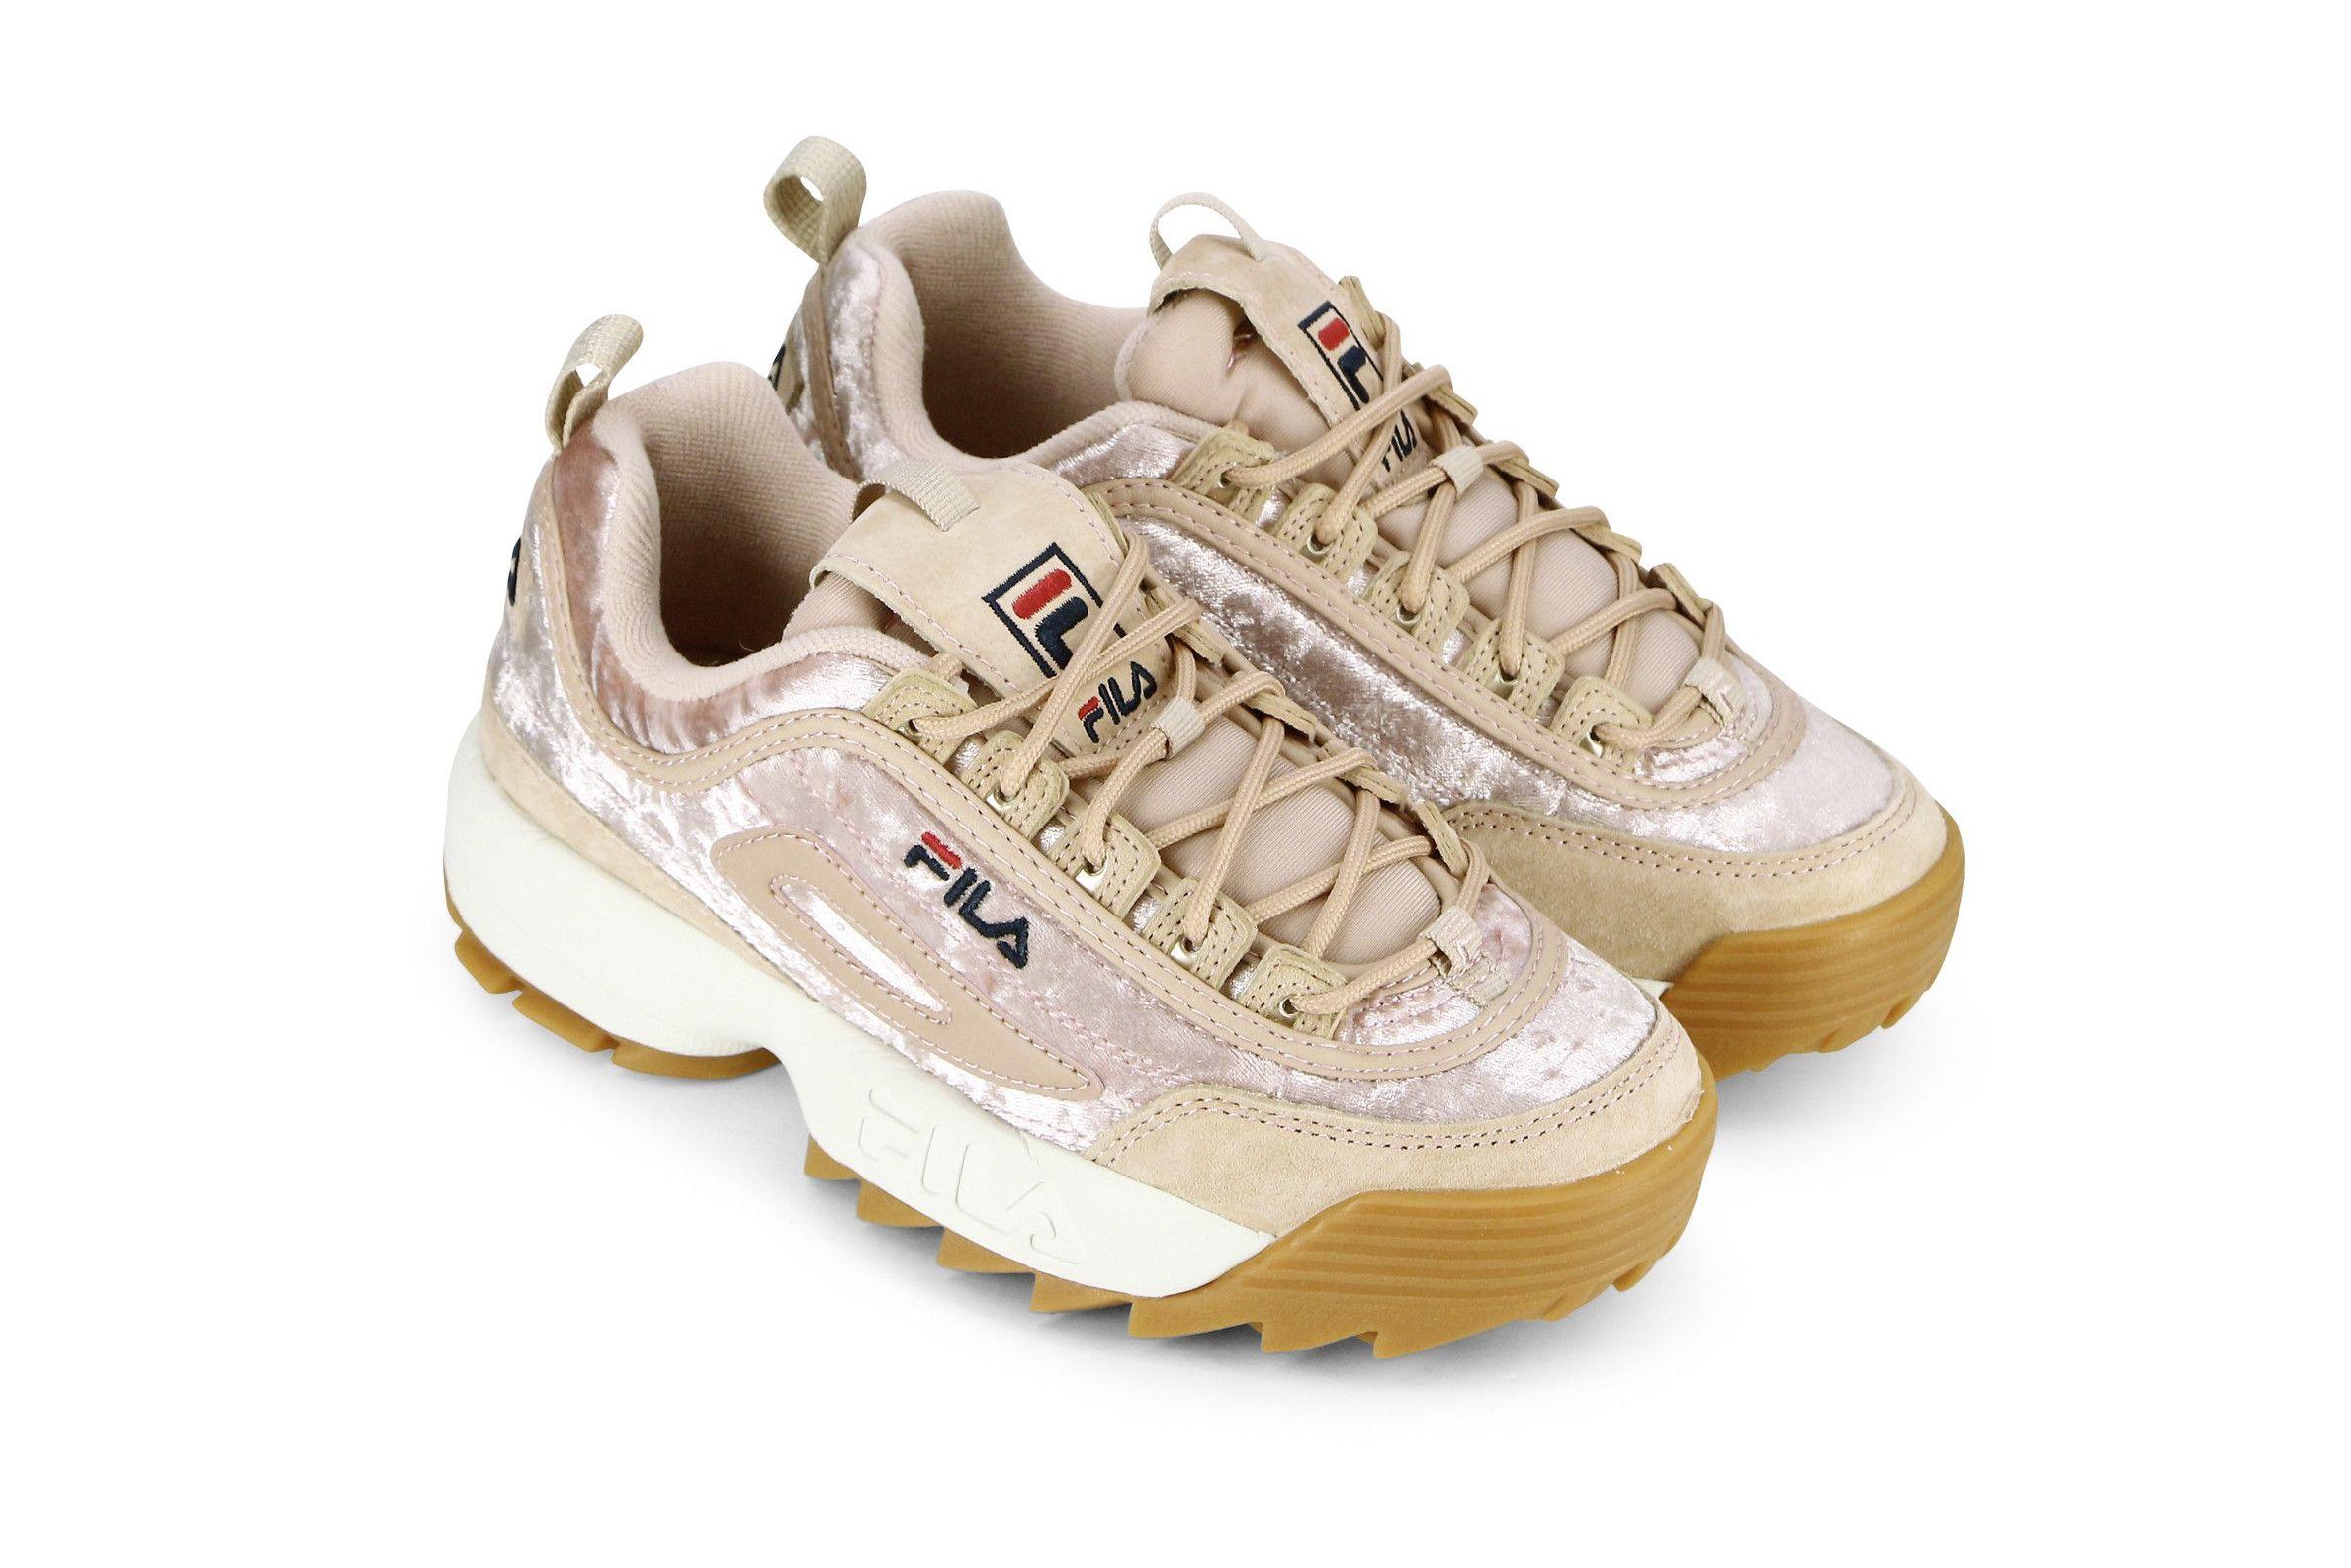 buty skate tanie jak barszcz gorące produkty FILA's Disruptor Sneaker Arrives in Two Velvet Colorways ...